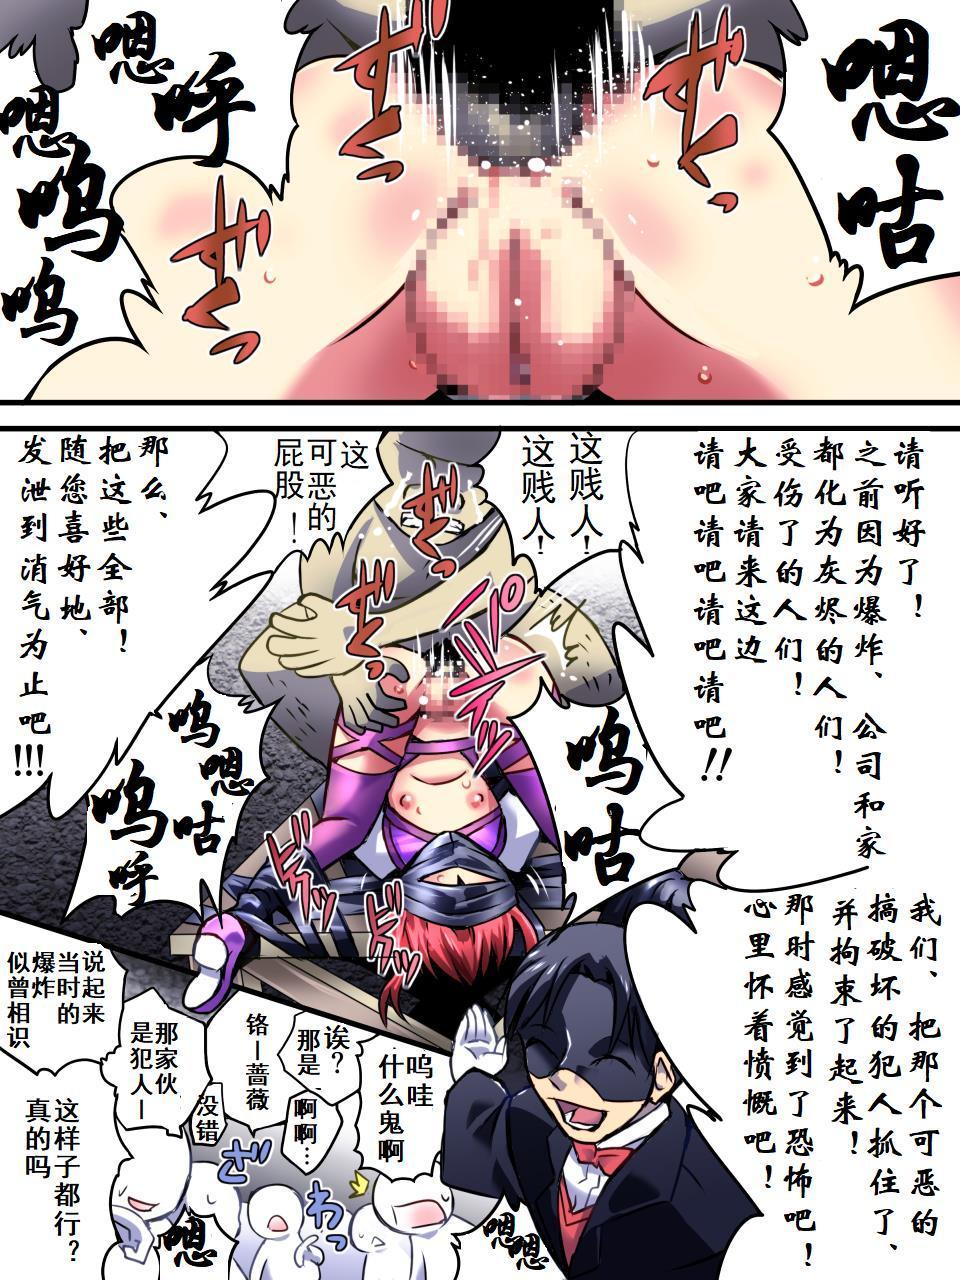 [Atelier Hachifukuan] Superheroine Yuukai Ryoujoku III - Superheroine in Distress [Chrome Rose Bell]   凌辱诱拐3 [Chinese] [有条色狼汉化] 26